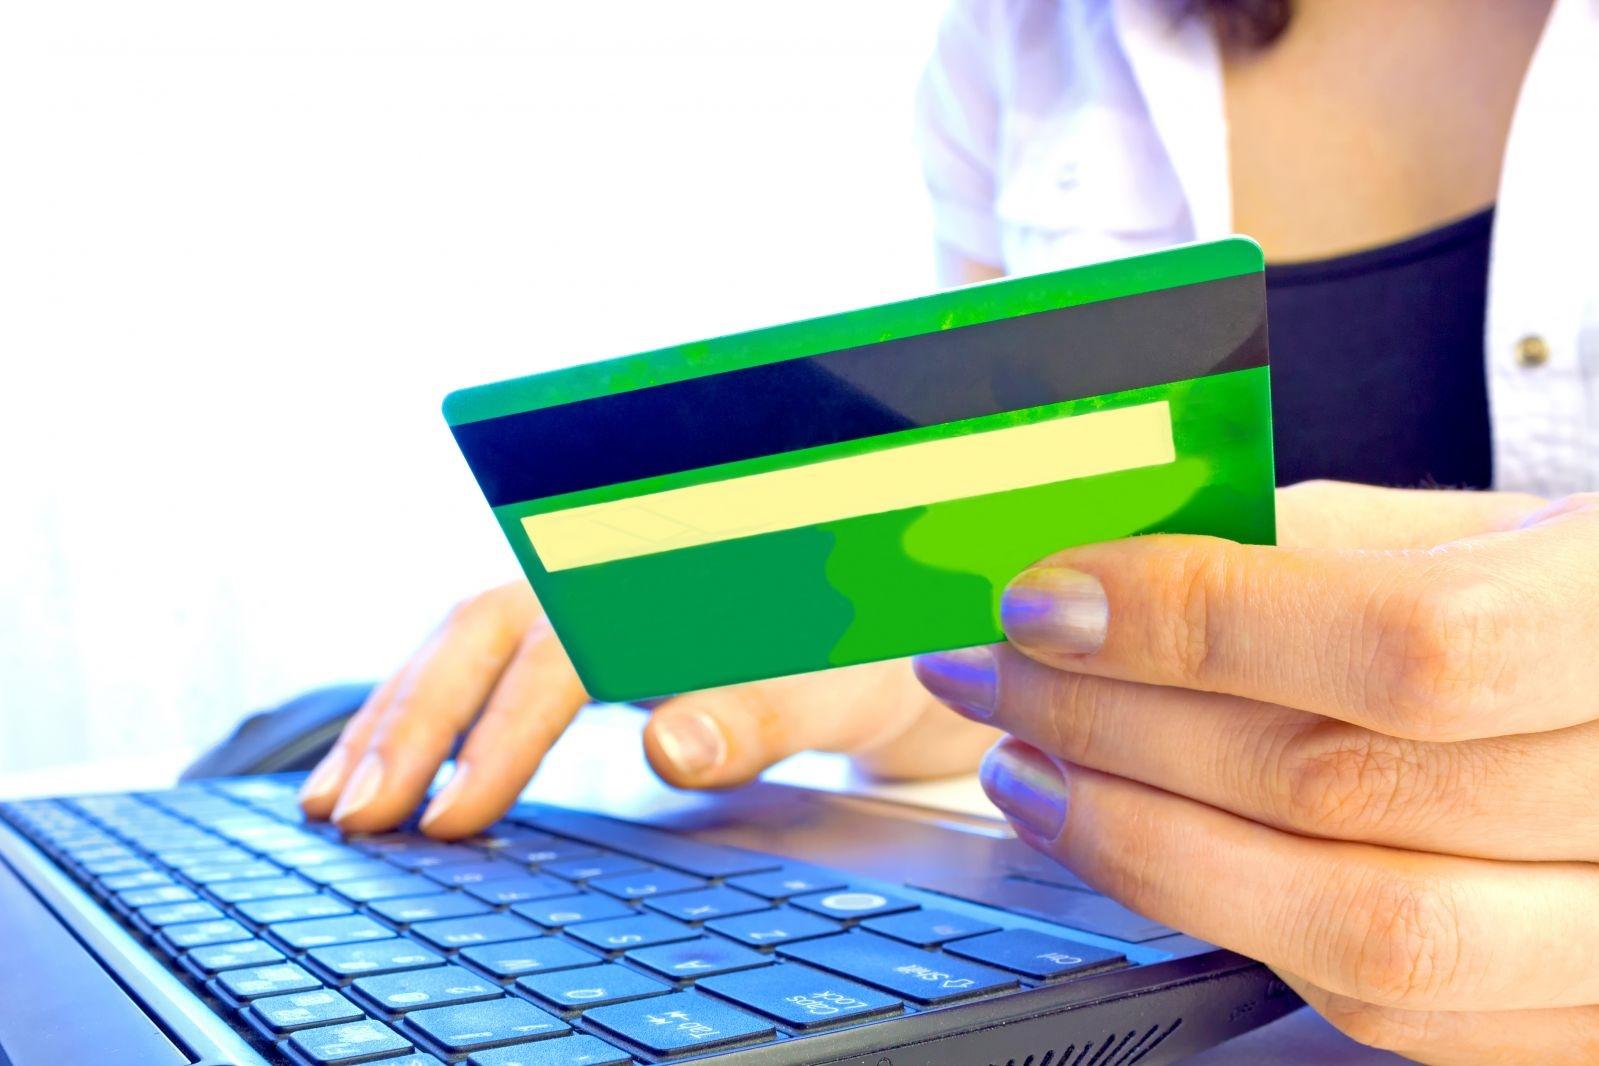 Imagem de Dia do Consumidor: confira as primeiras ofertas e economize no tecmundo